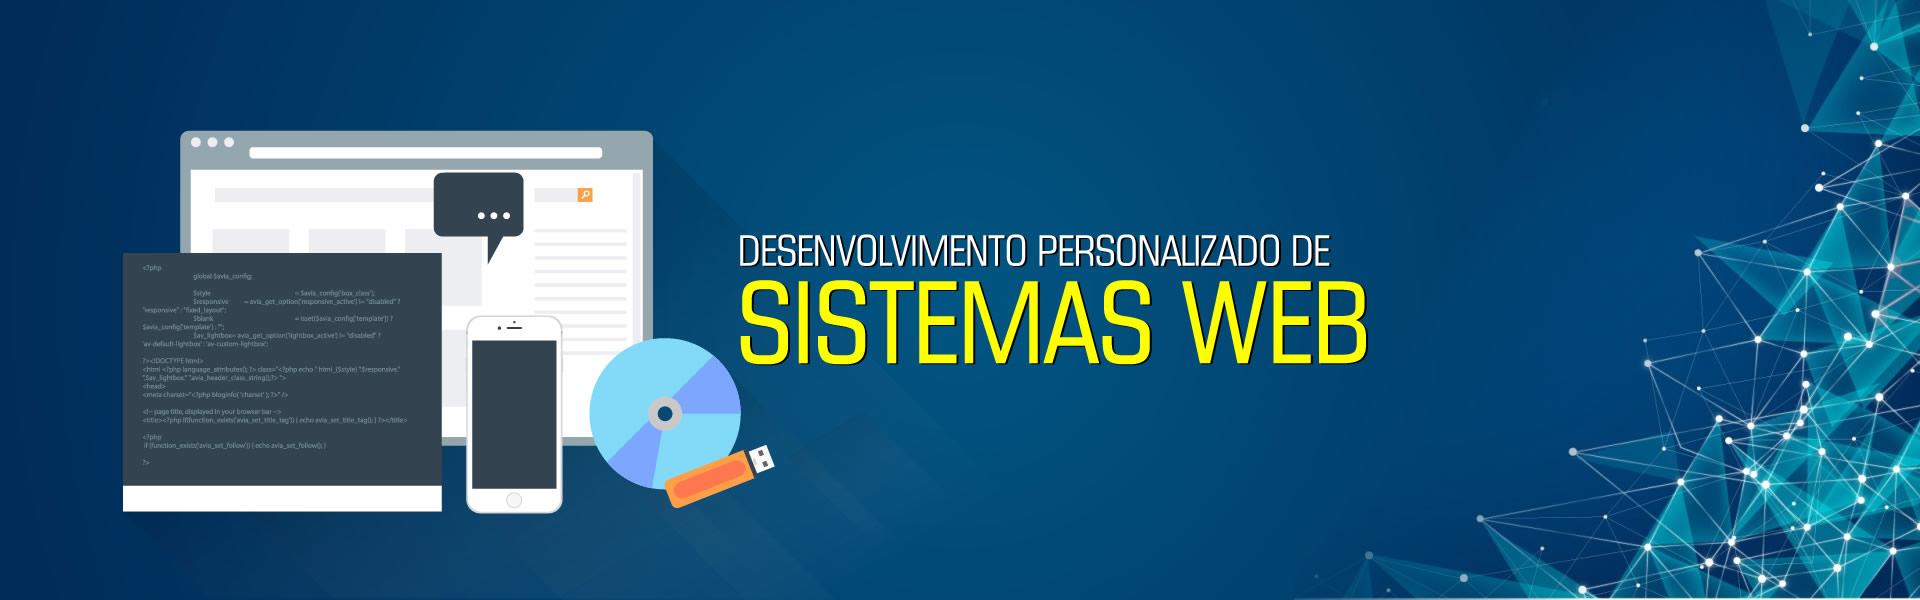 slide-sistemas1